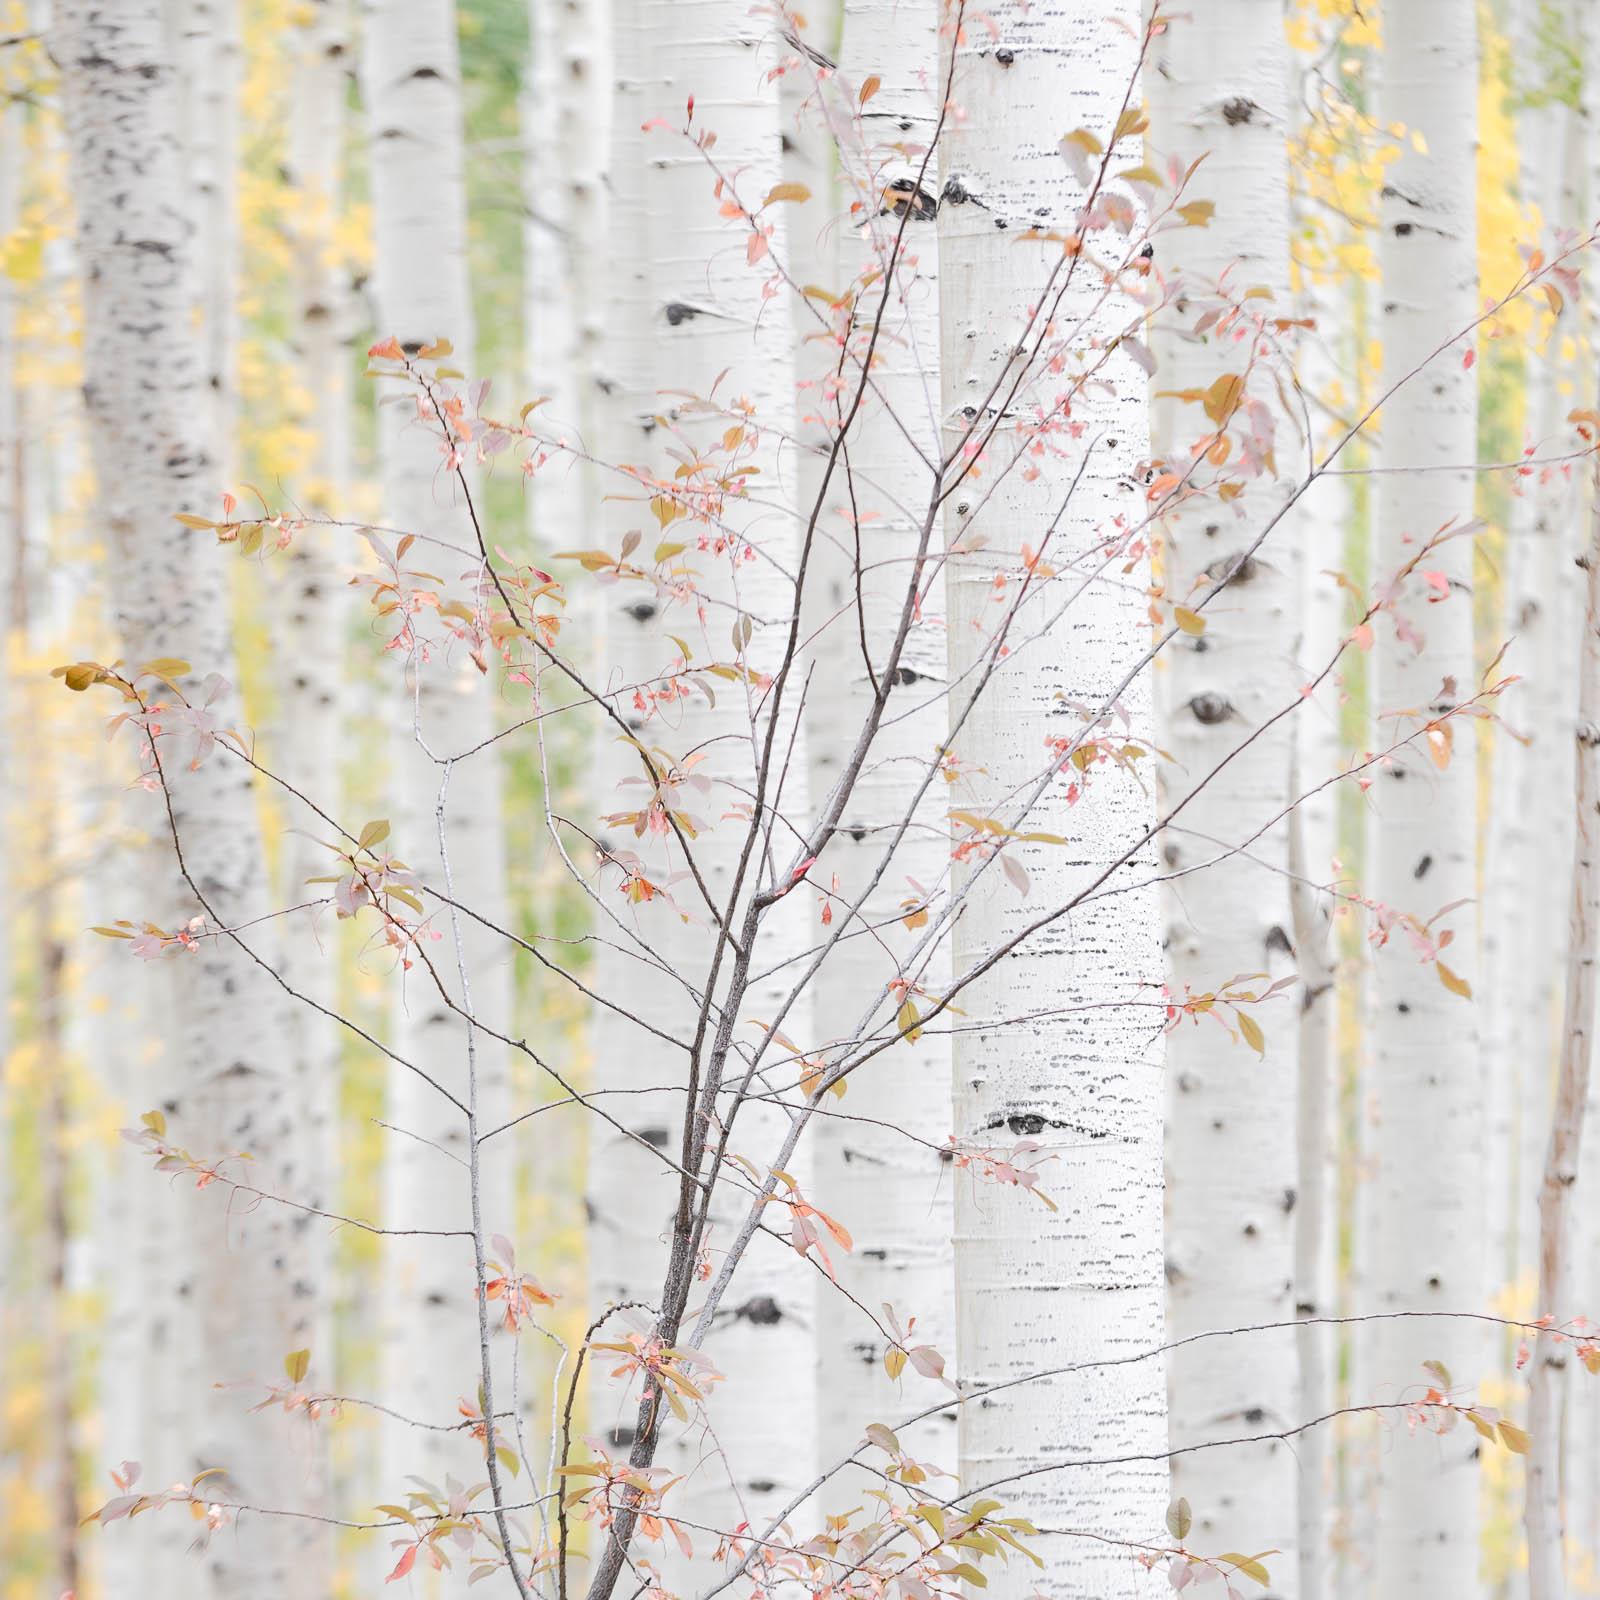 colorado, fall, leaves, red, rocky mountains, san juan mountains, square, white, yellow